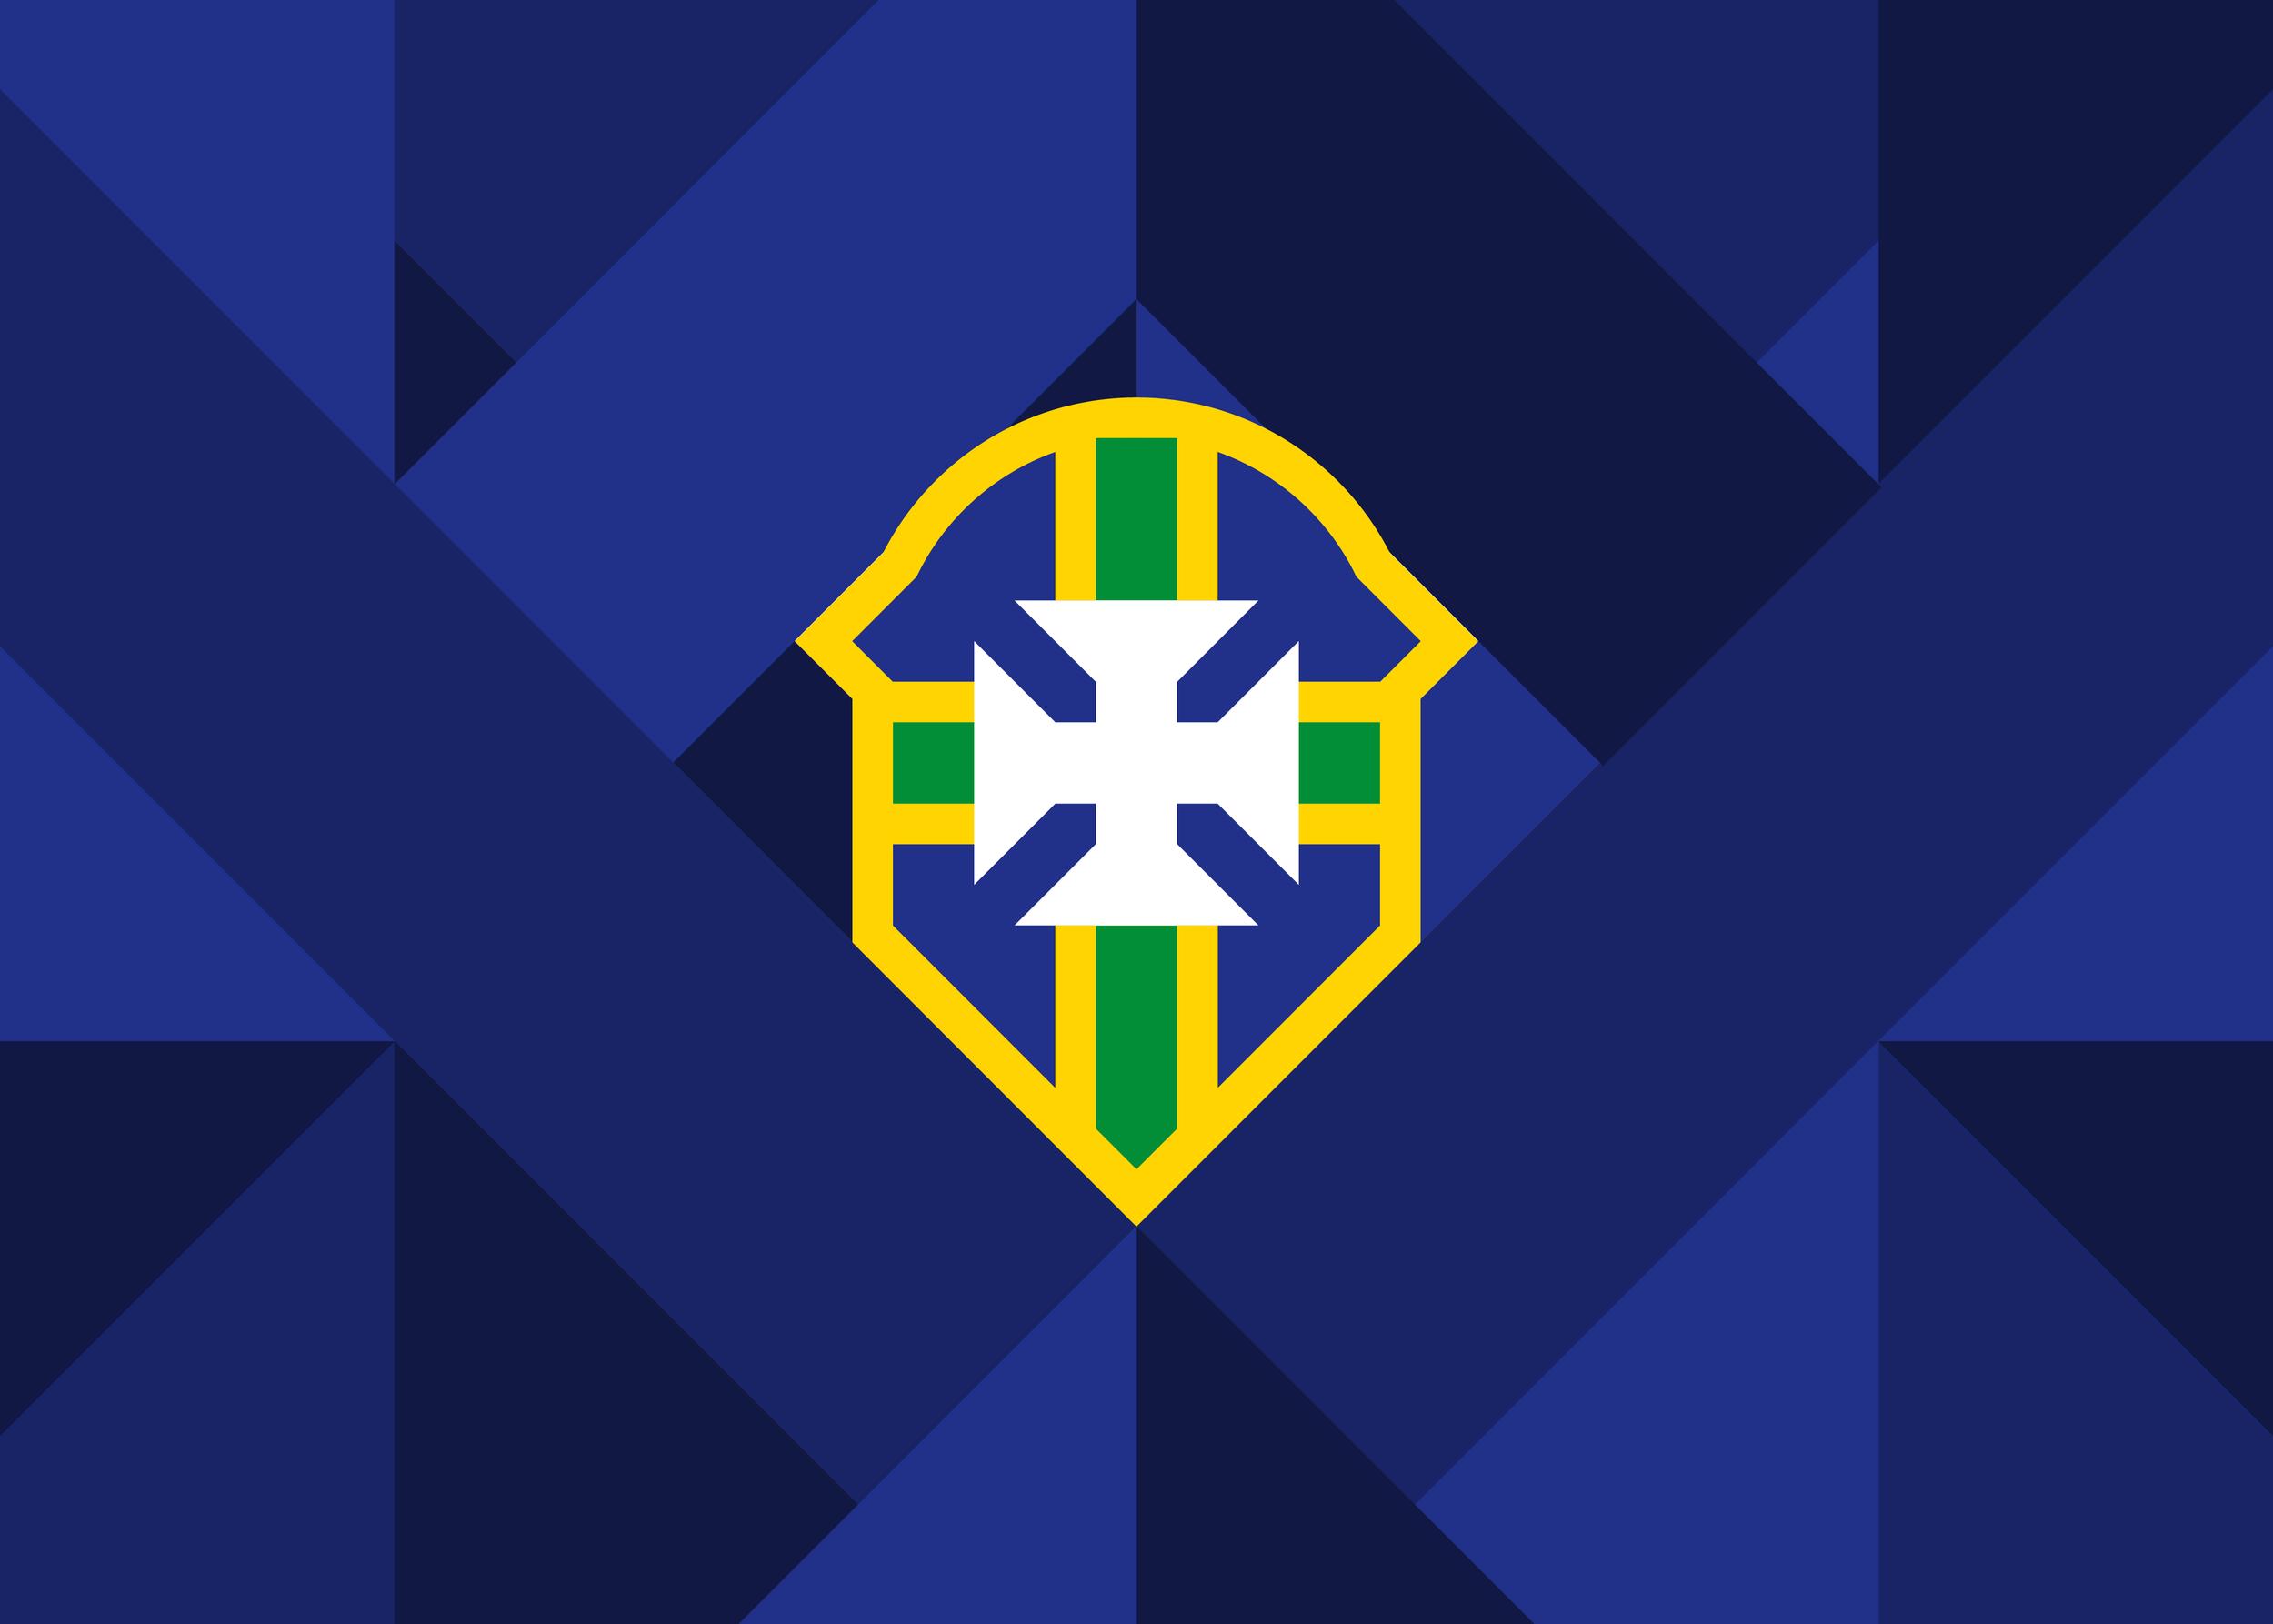 Brazil-Geometric-World-Cup-Football-Badge-02-Logo-Design-Freelance-Kent.png